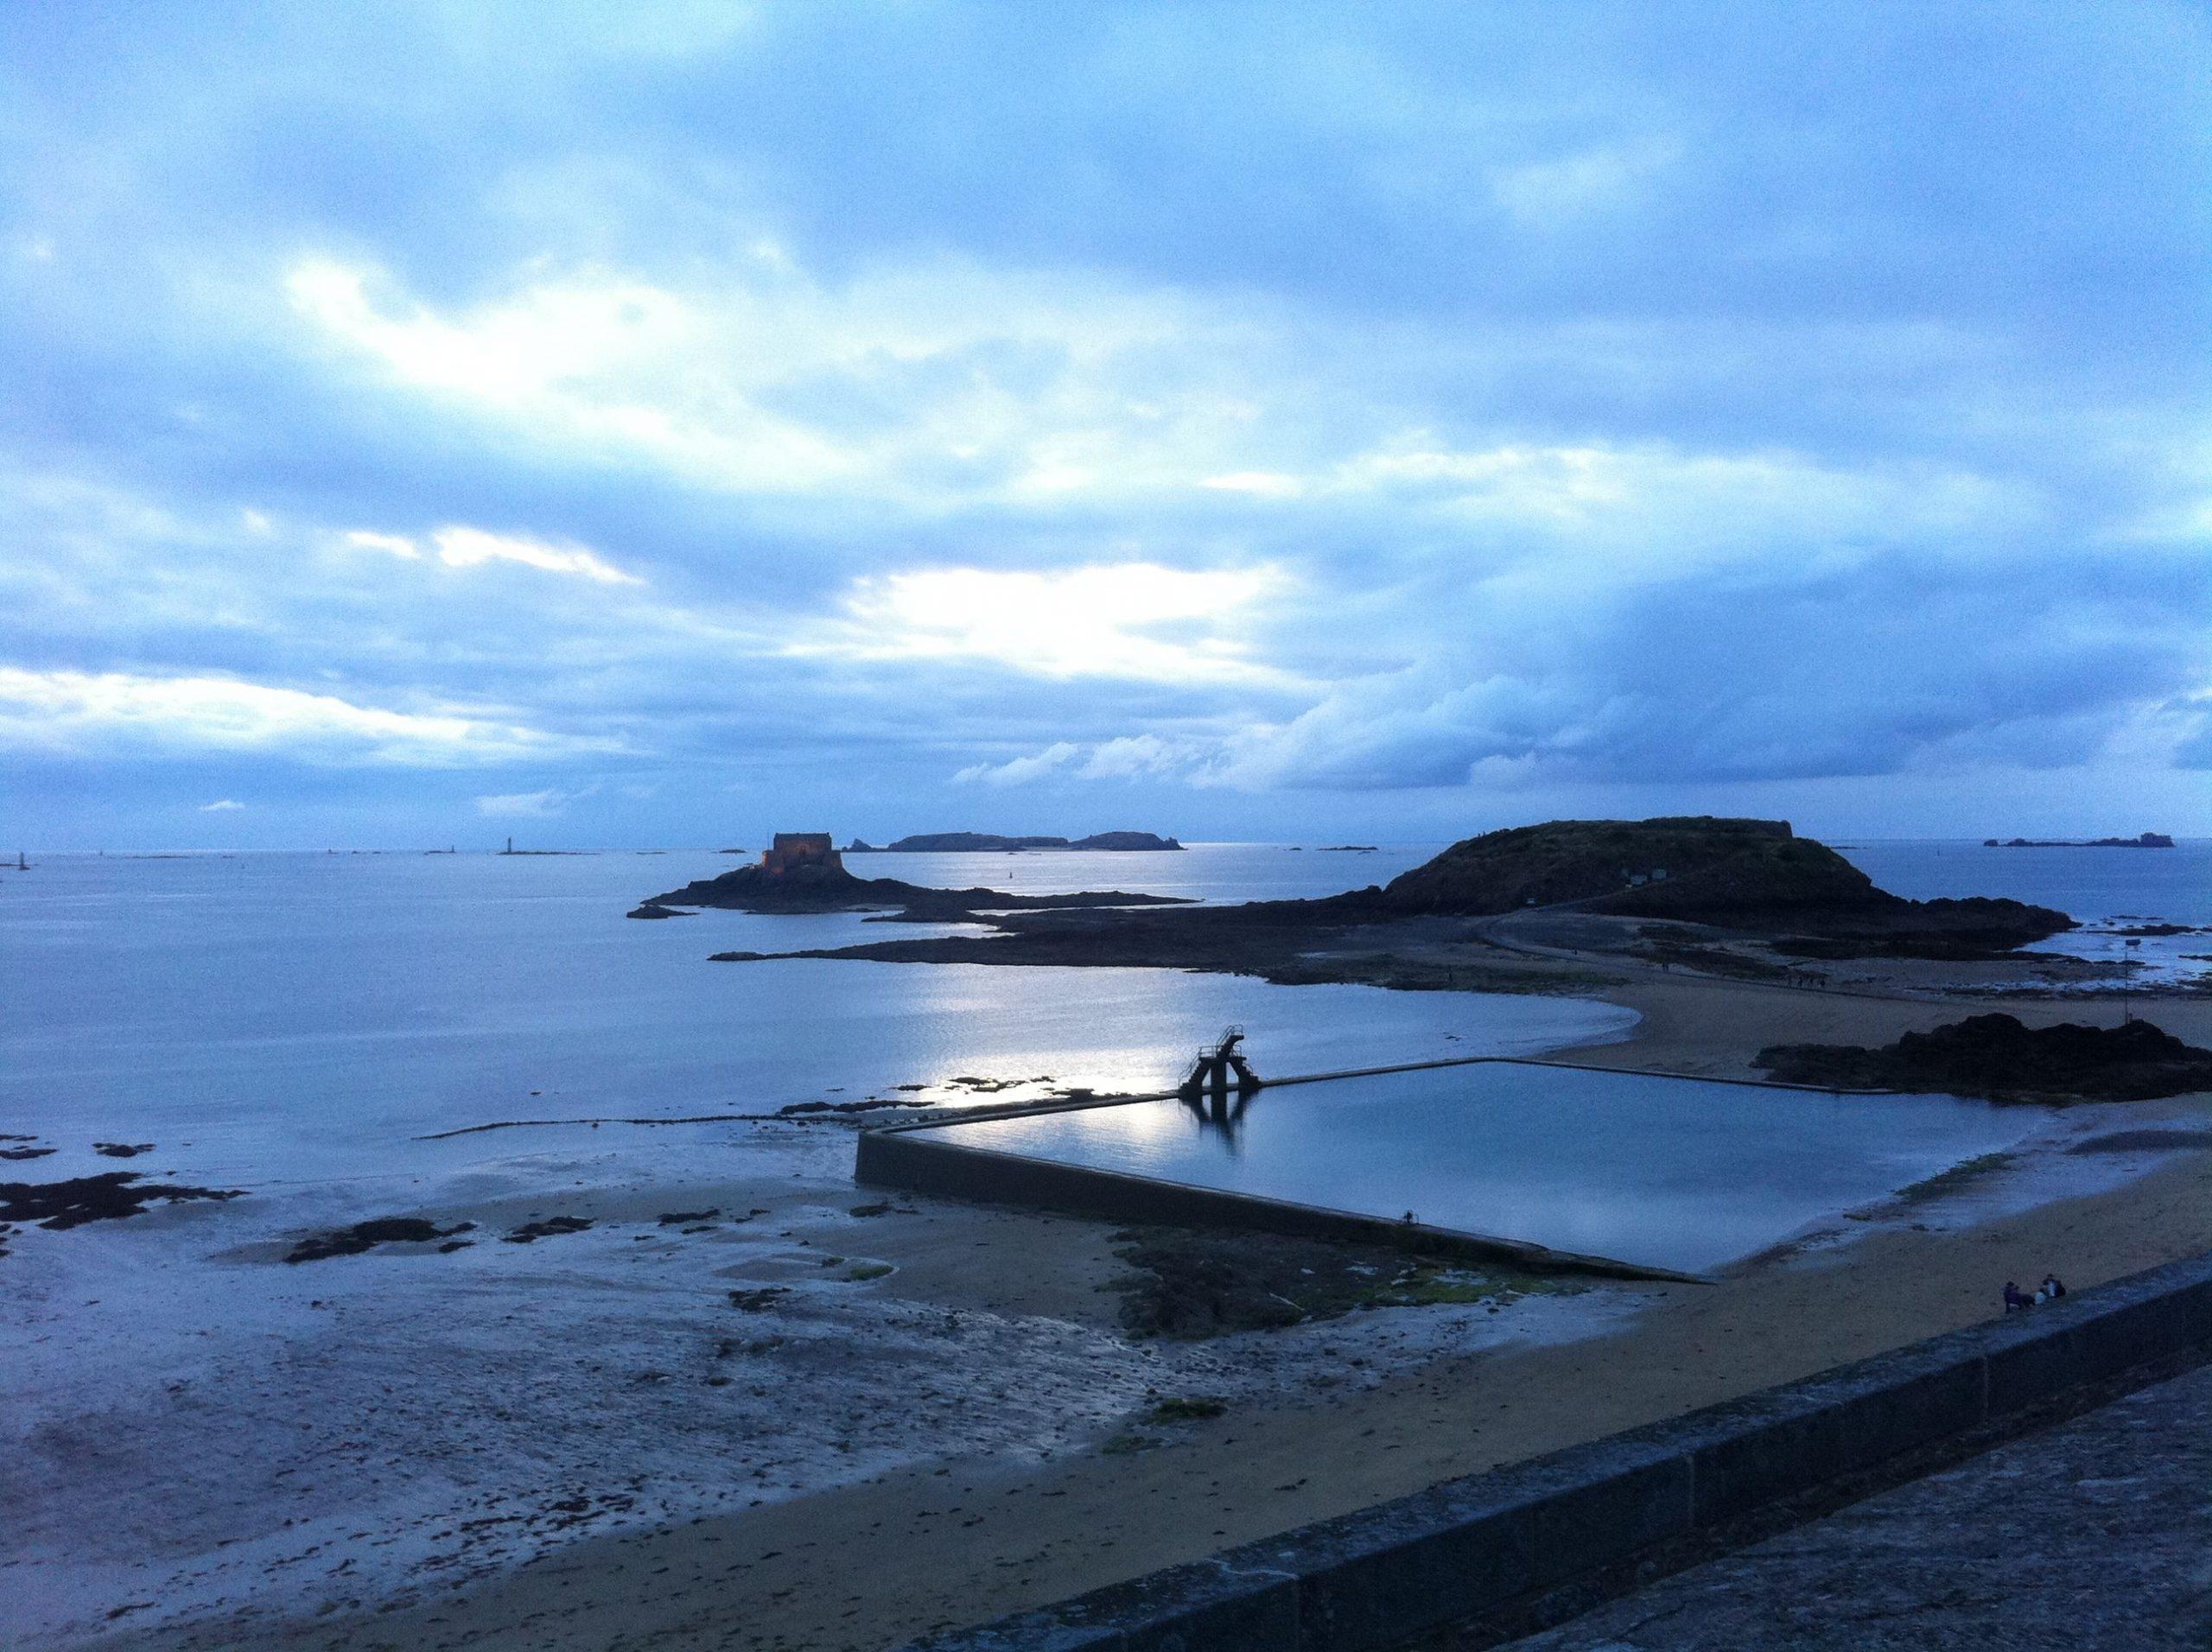 Piscine Naturelle... Bon-Secours | Piscine Naturelle, Piscine à Piscine St Malo